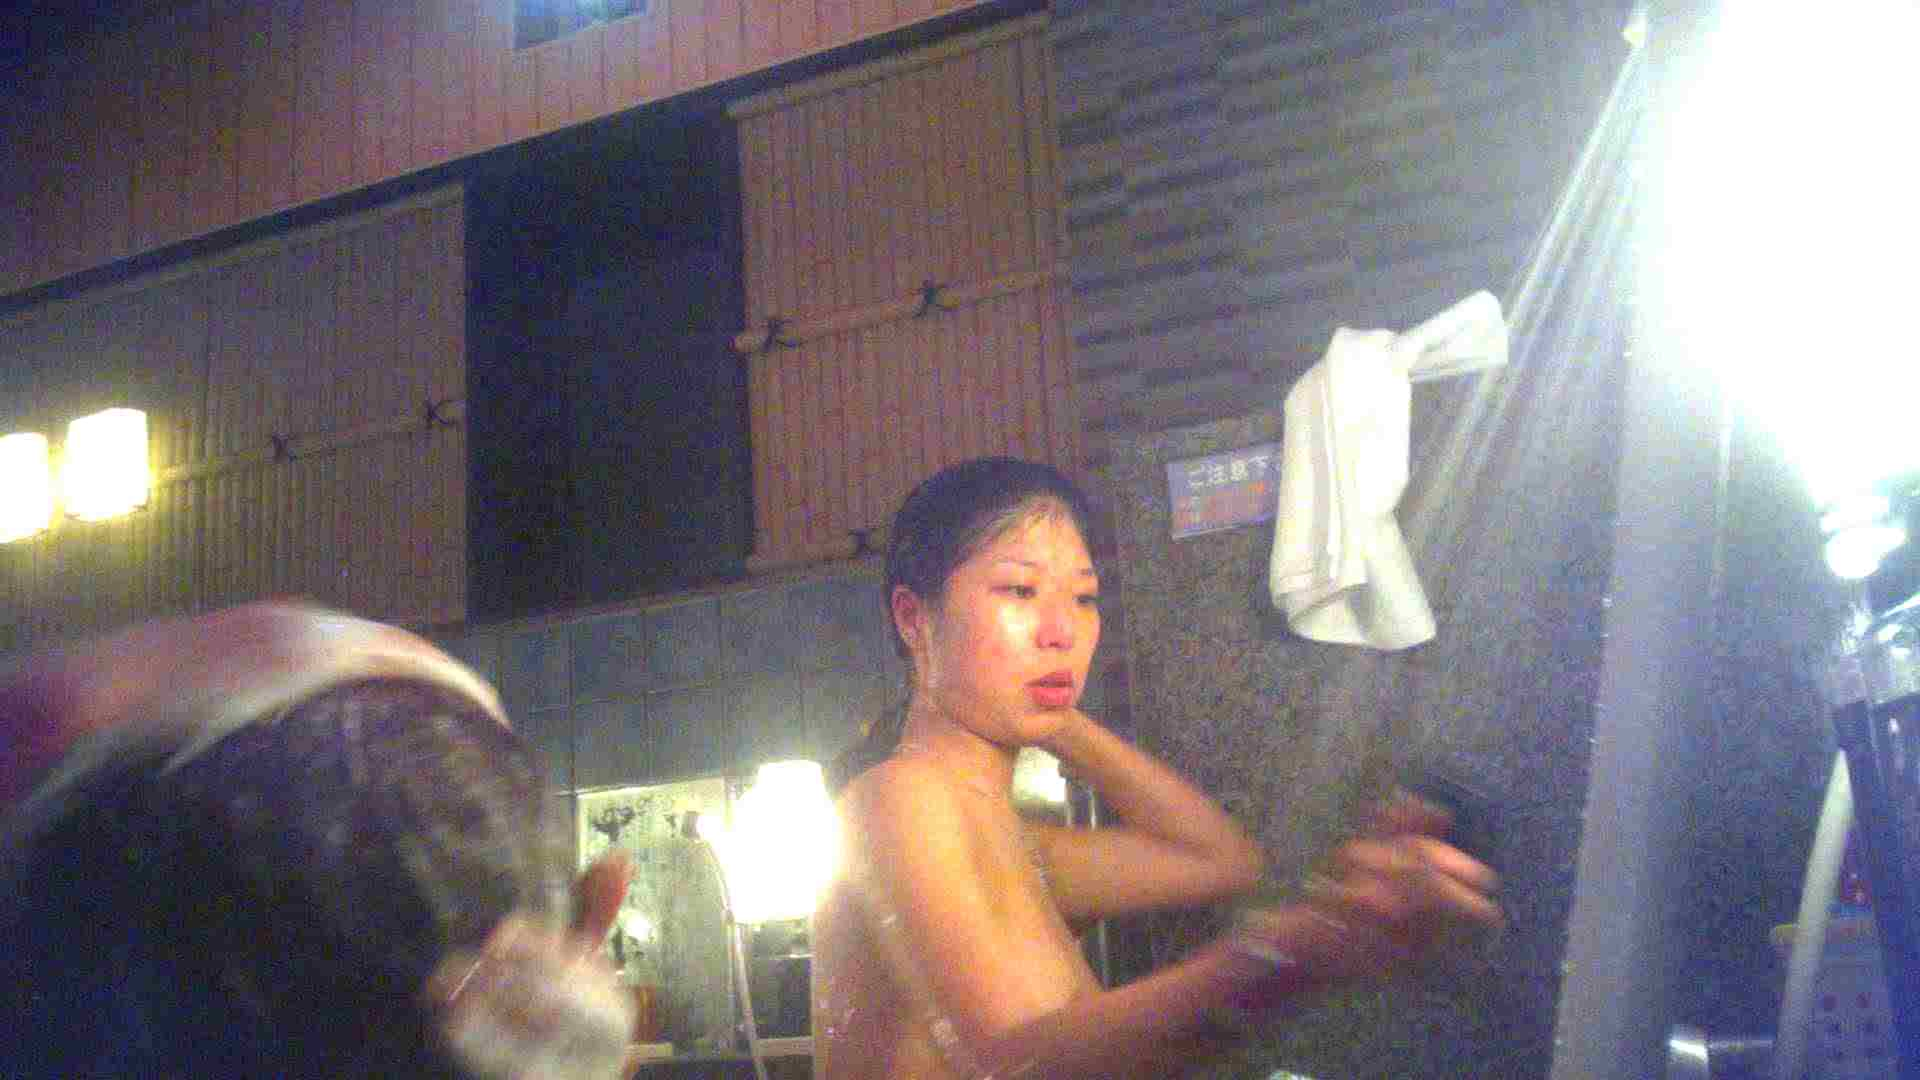 TG.13 【一等兵】可愛い・・・特に目が素敵・・・見つめられると・・・ 女風呂 おめこ無修正画像 61画像 35